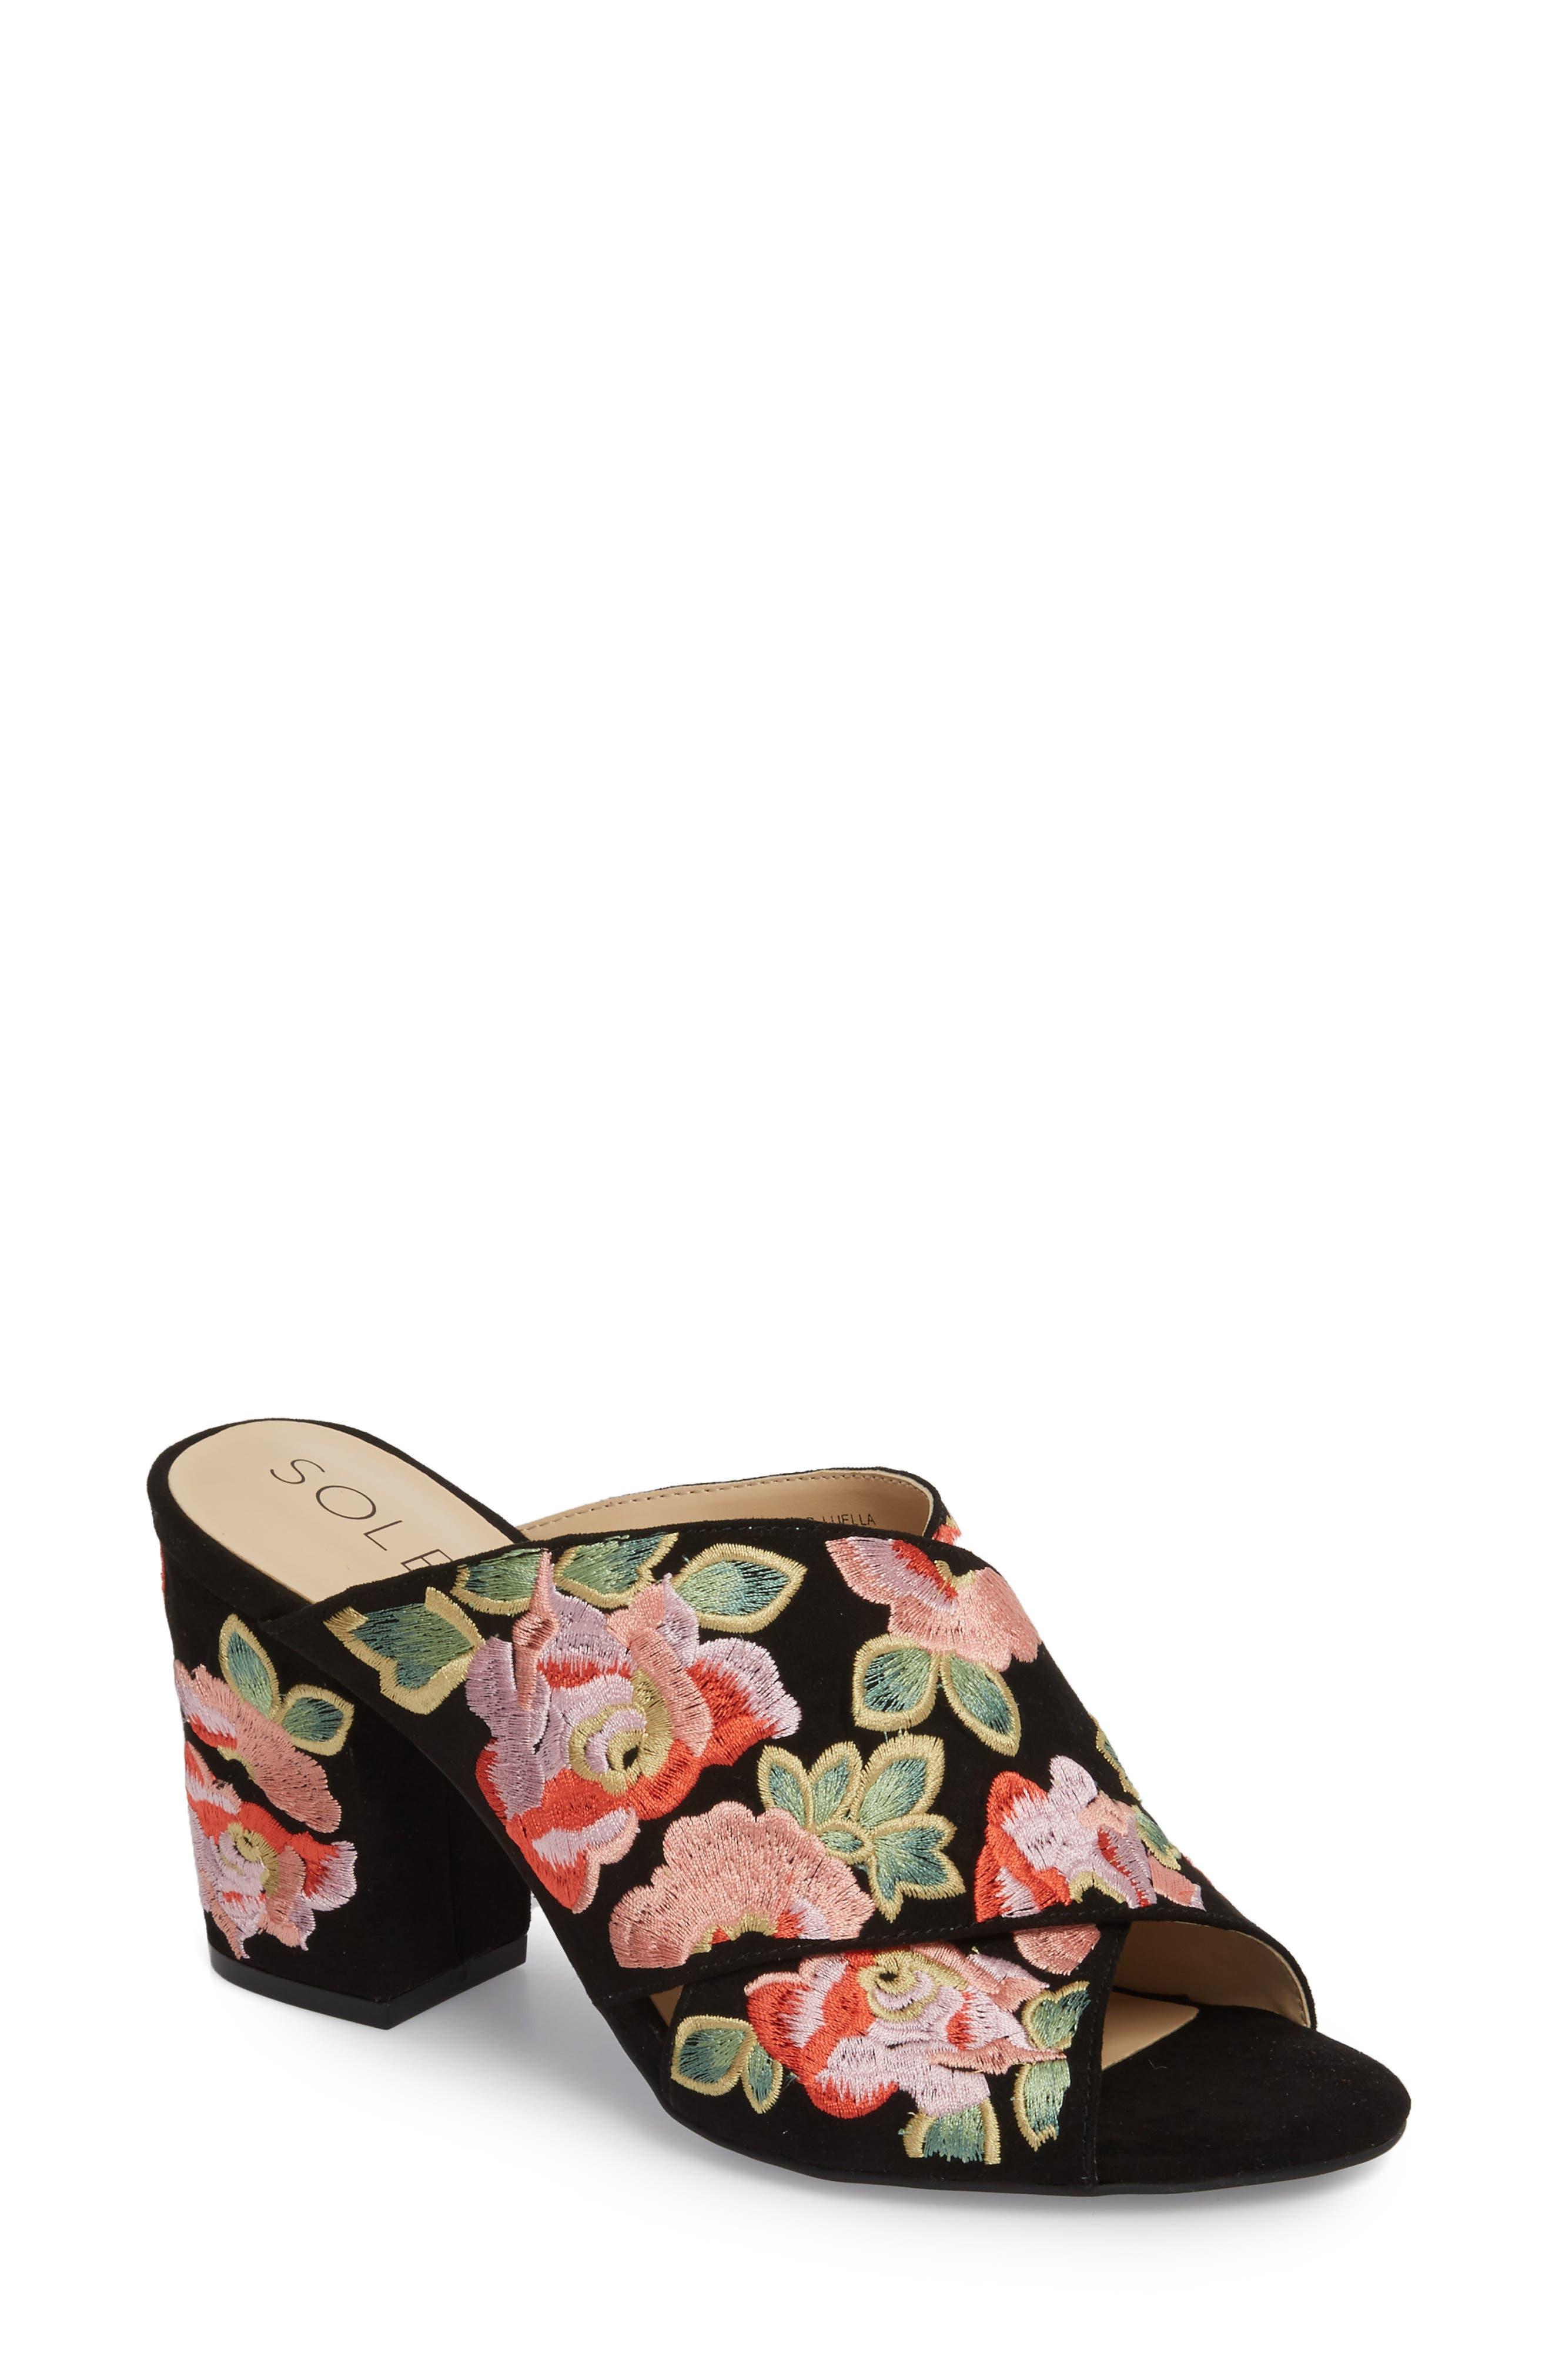 Luella Flower Embroidered Slide,                         Main,                         color, 001